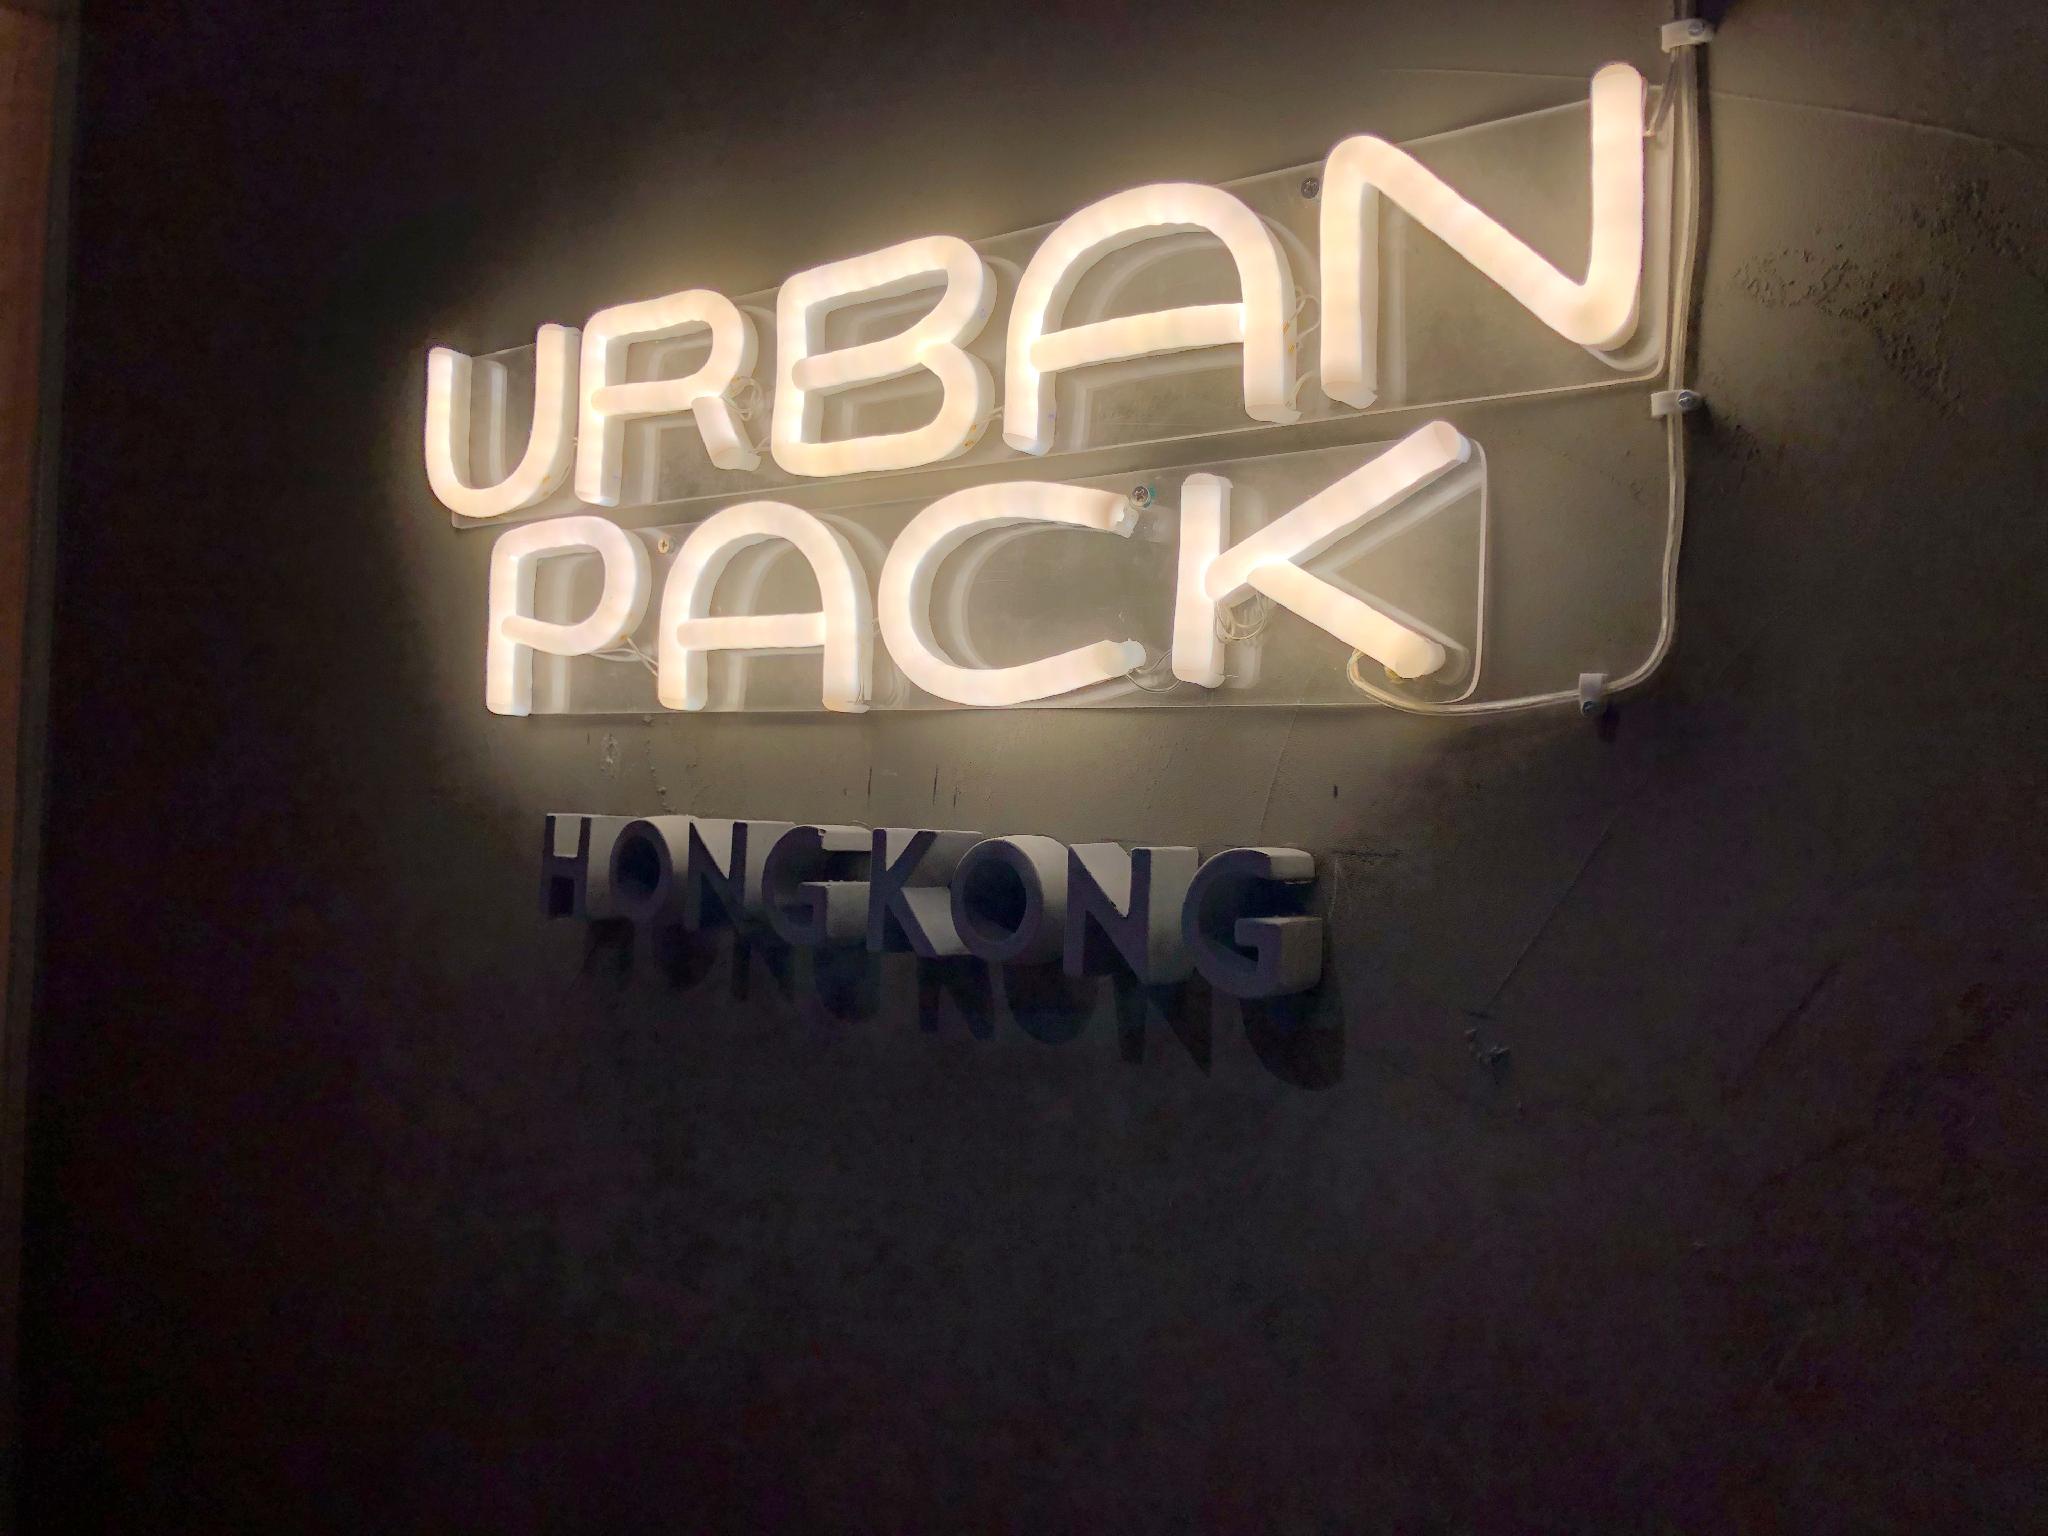 Urban Pack Hostel